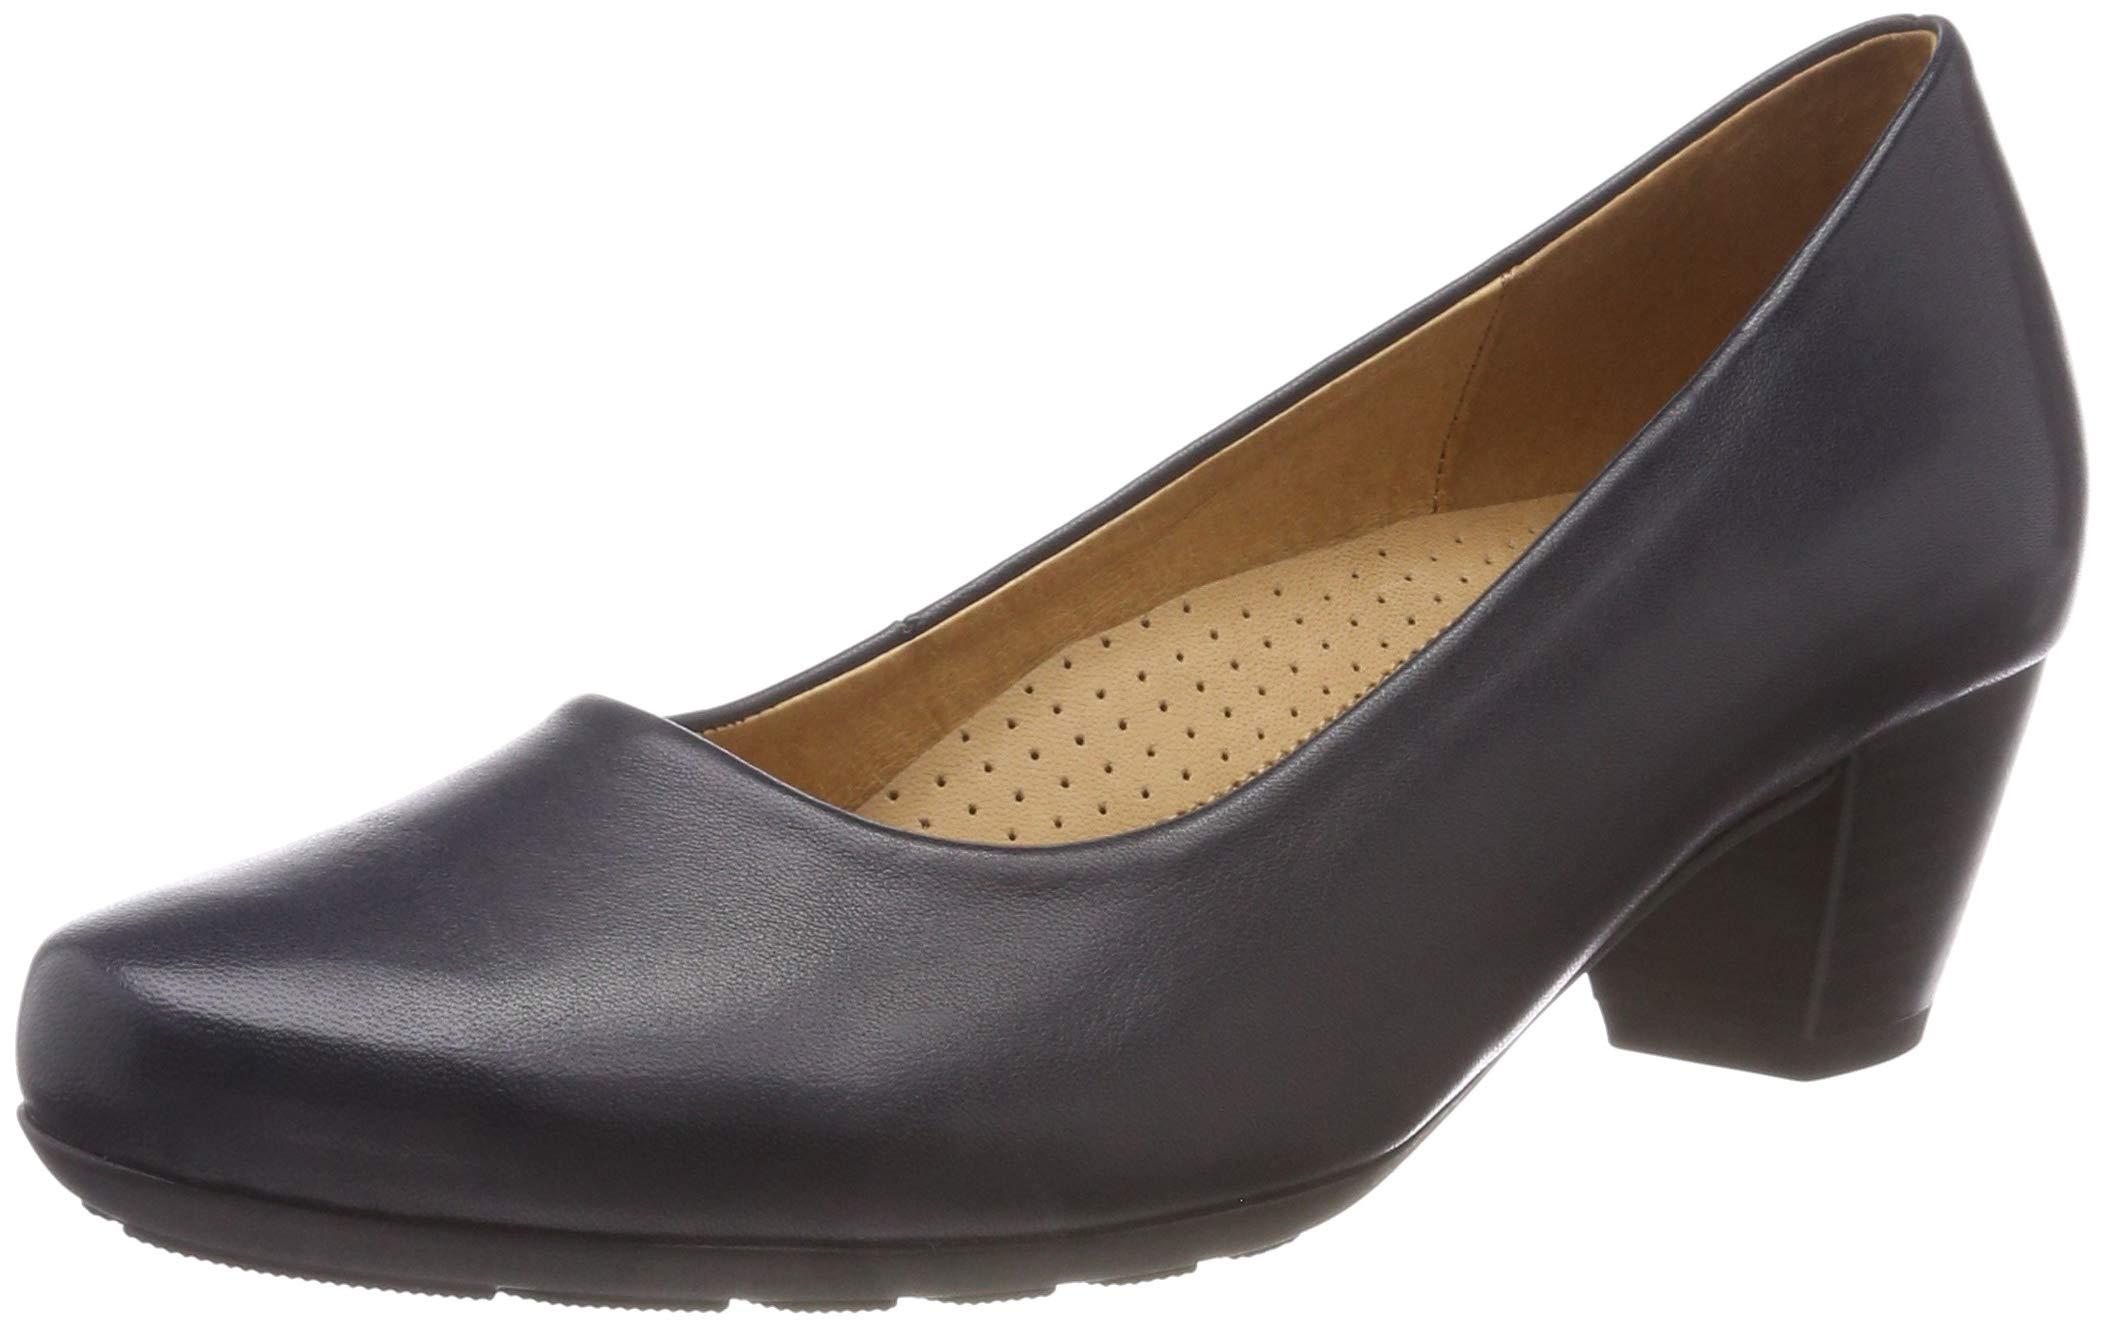 5 FemmeBleuocean 2640 FashionEscarpins Eu Gabor Shoes Comfort m0wN8n